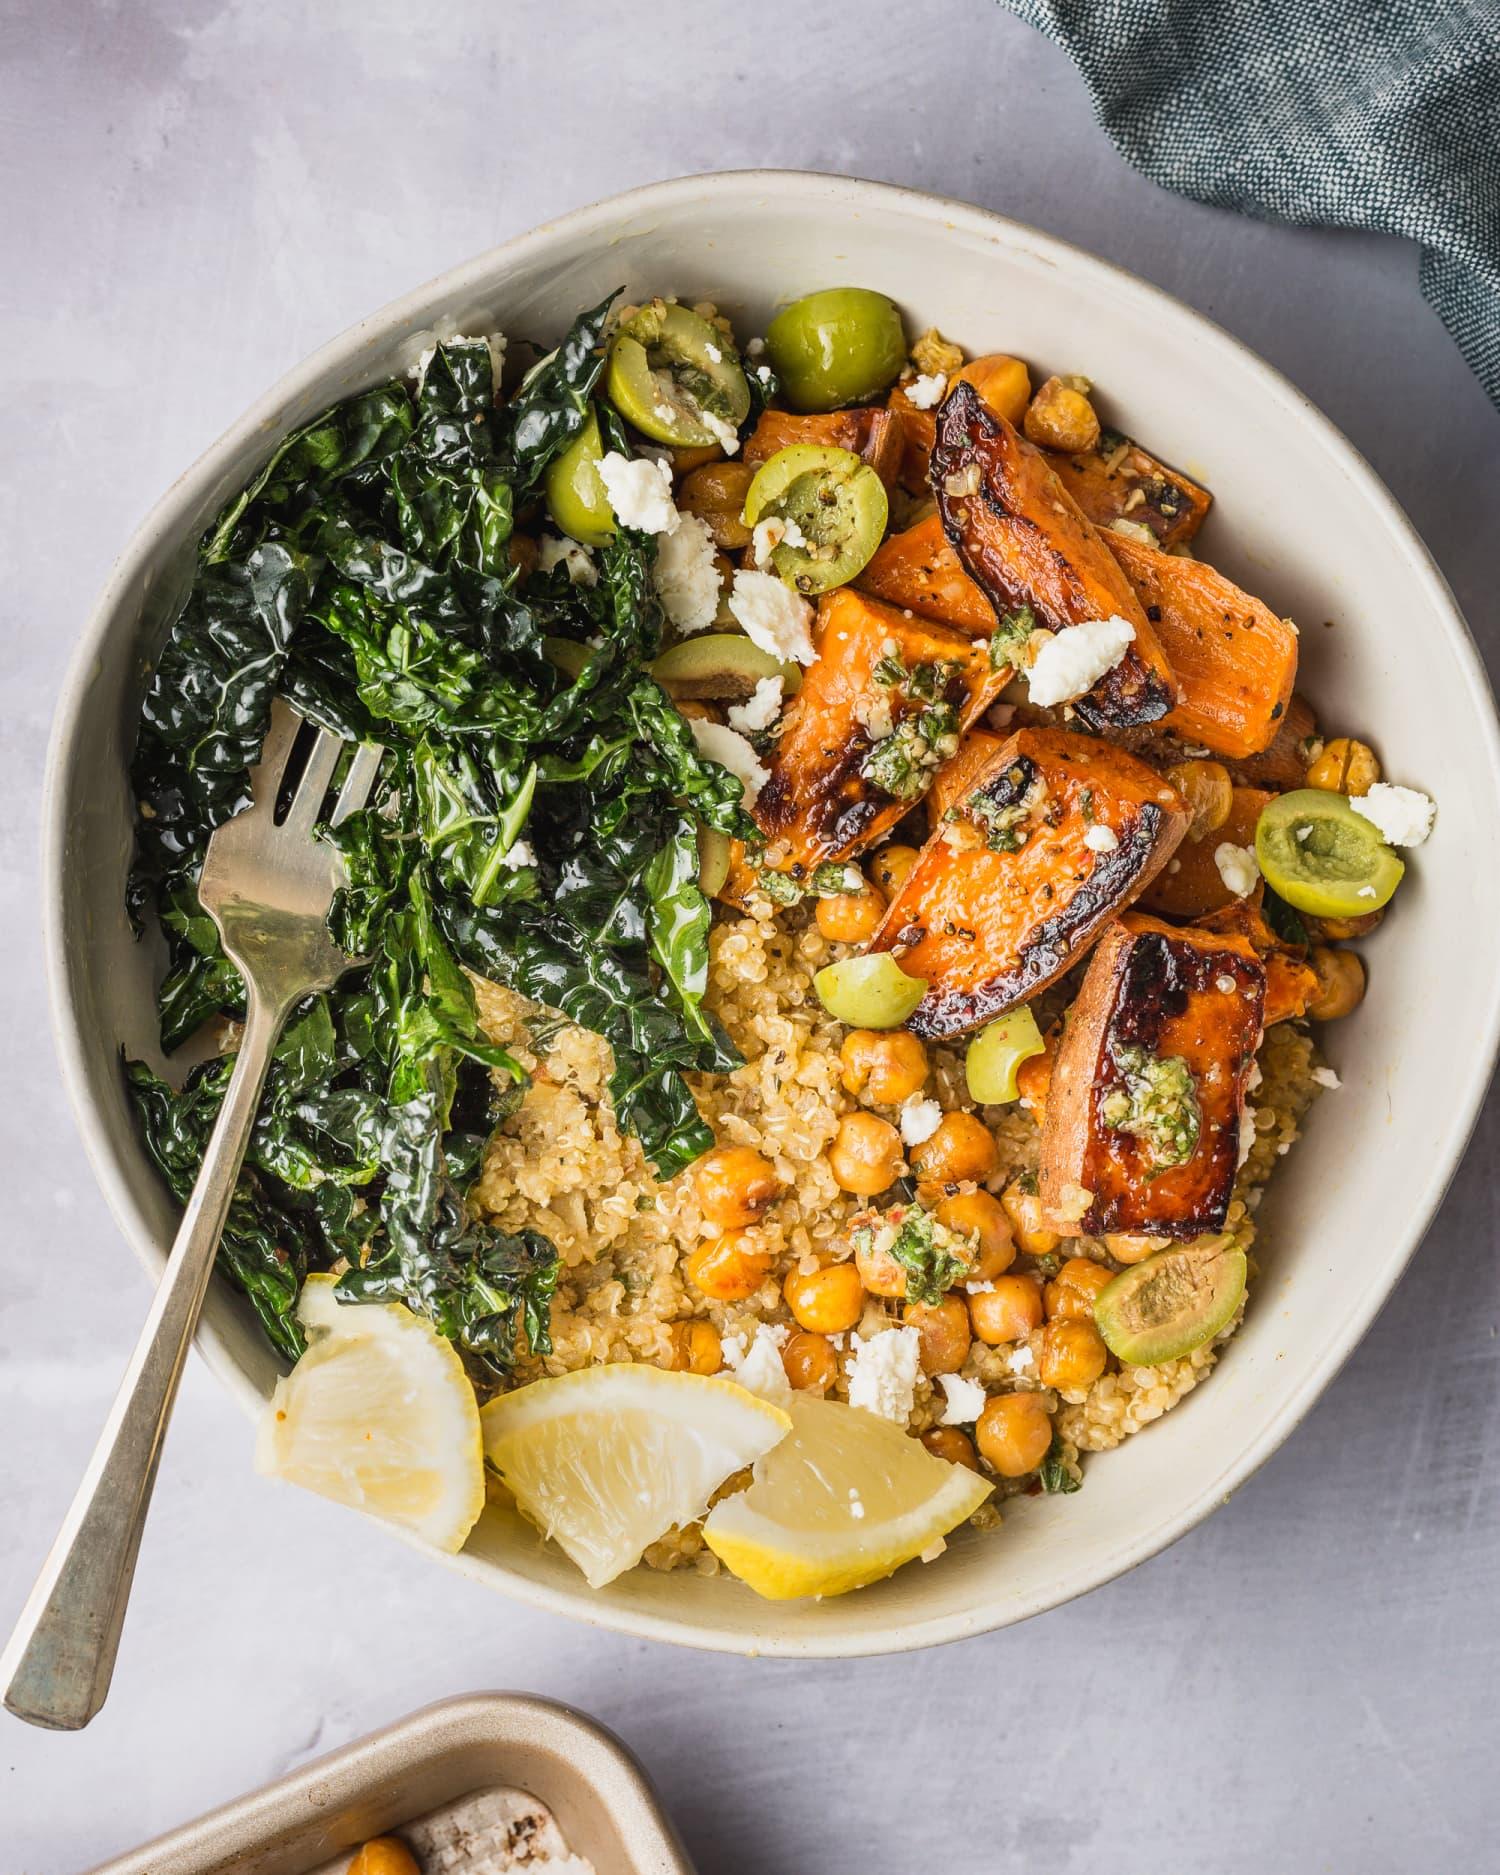 Recipe: Sweet Potato Quinoa Bowls with Crispy Chickpeas and Chopped Pesto